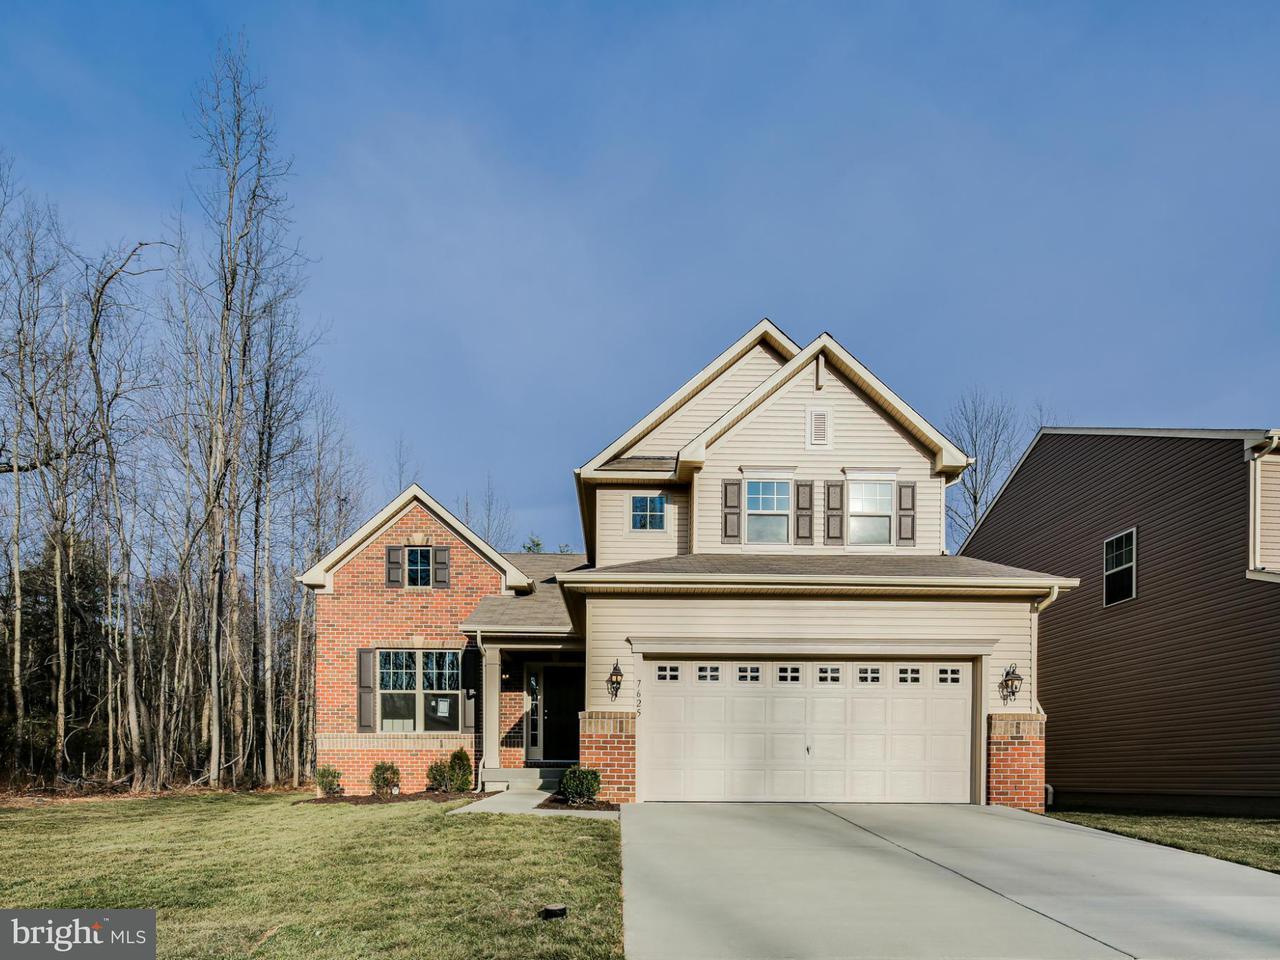 Single Family Home for Sale at 1517 Katla Court 1517 Katla Court Harmans, Maryland 21077 United States